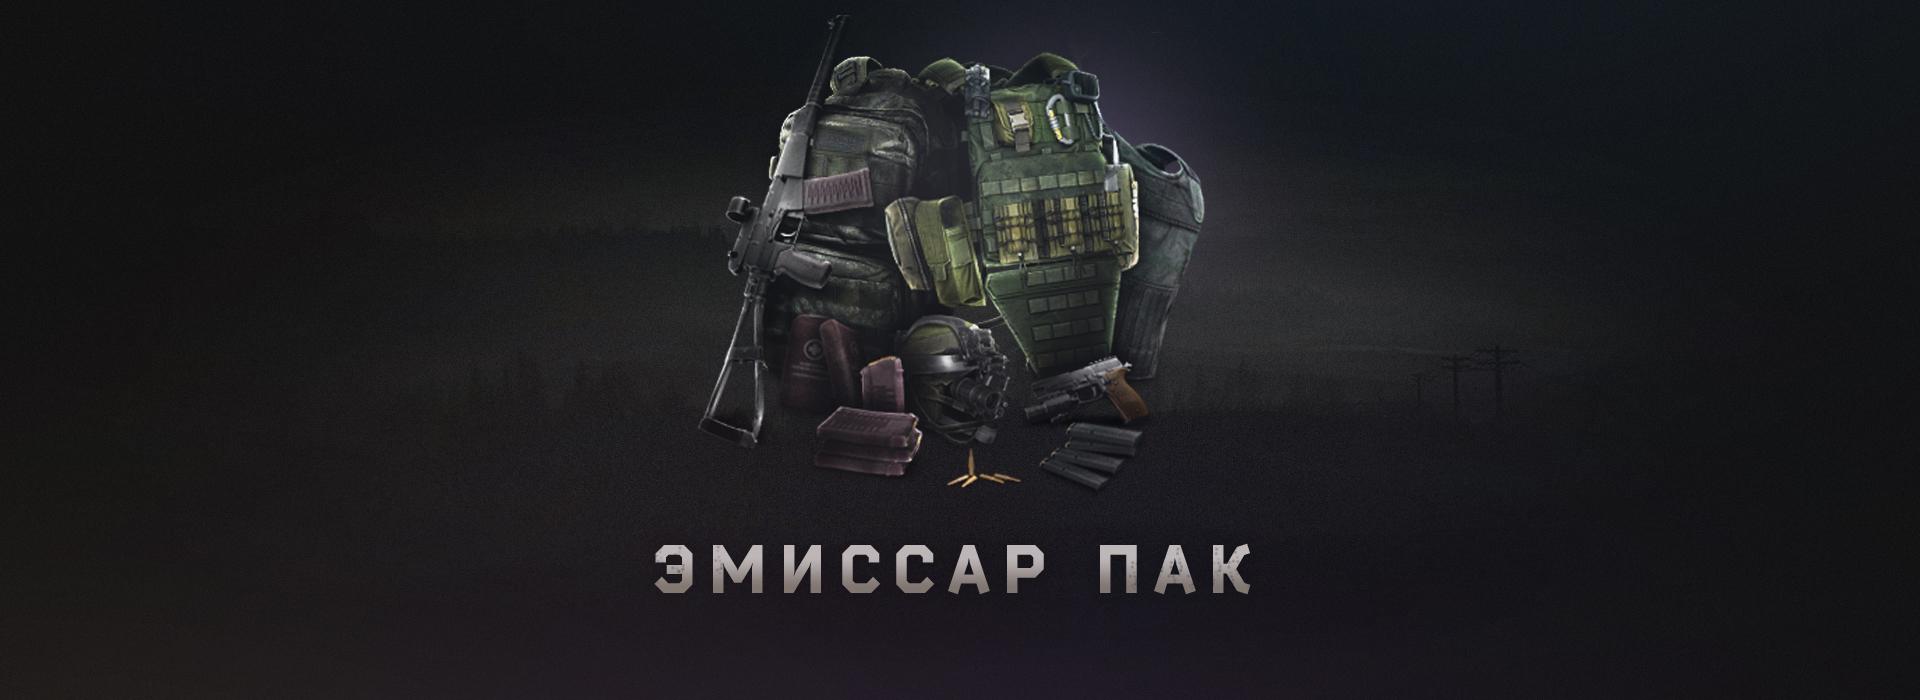 Emissary_PackRUS